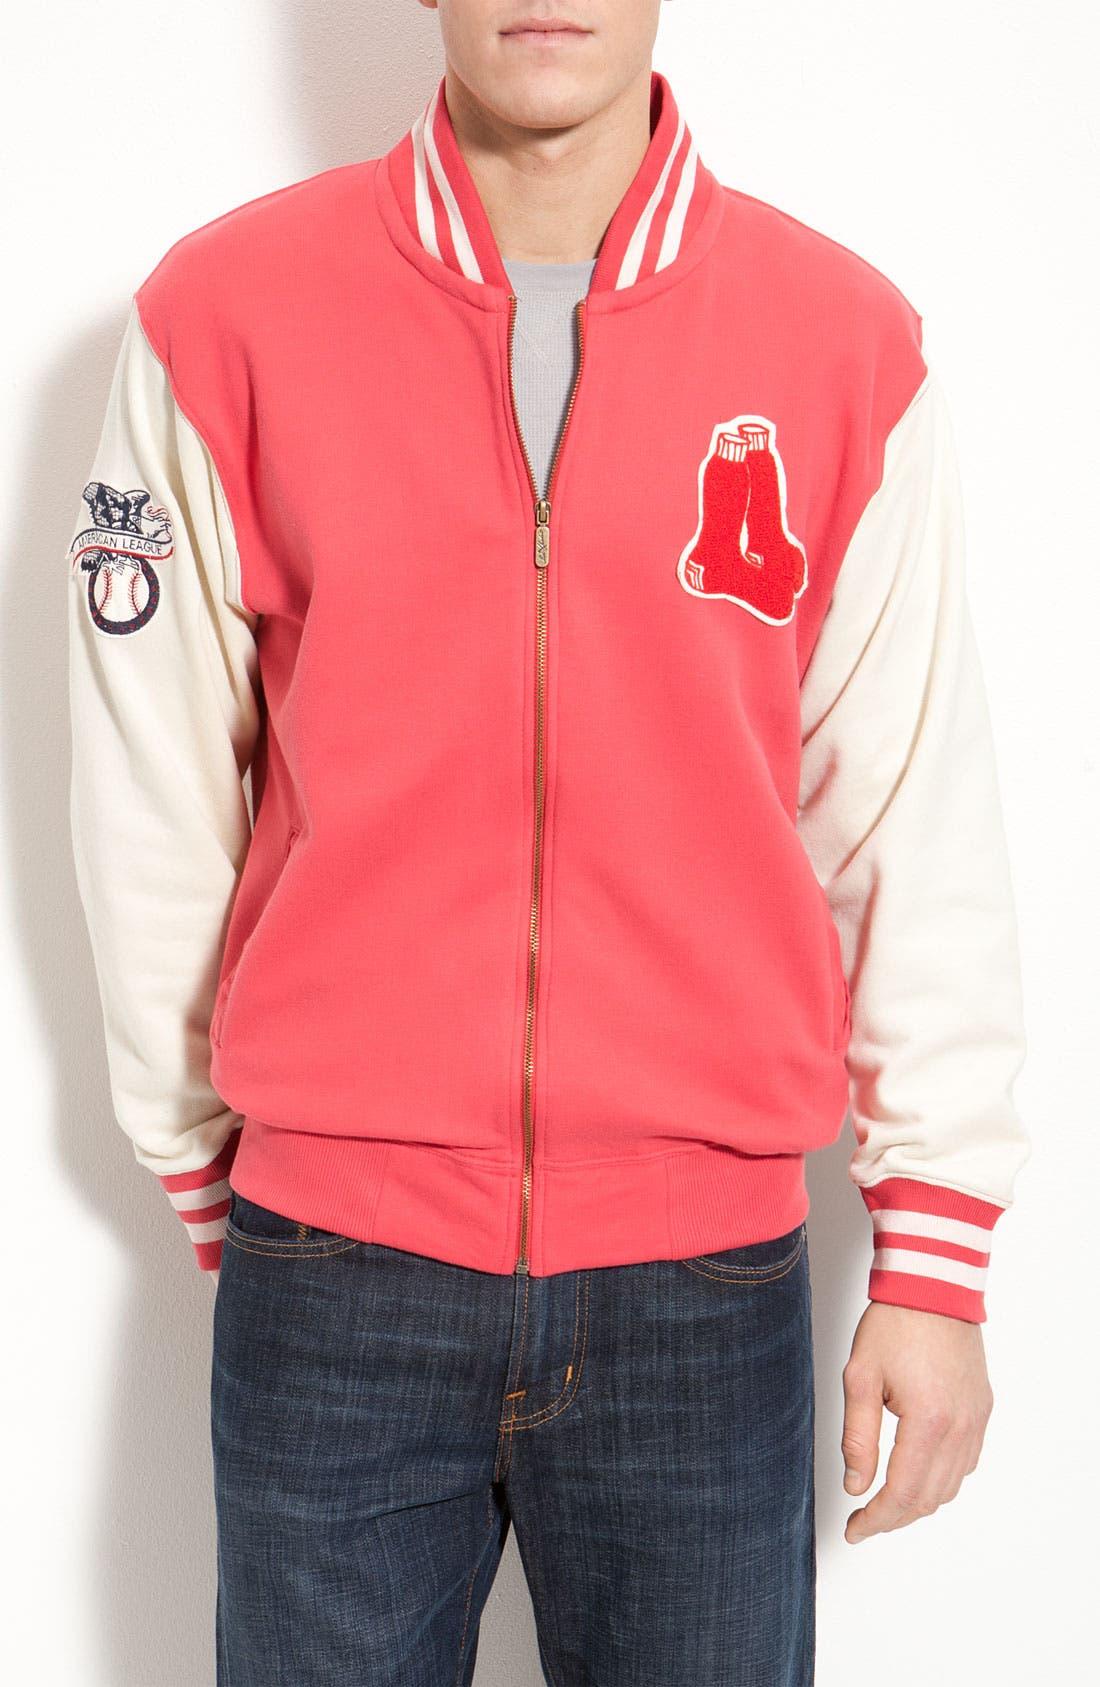 Alternate Image 1 Selected - Red Jacket 'Homeroom Red Sox' Jacket